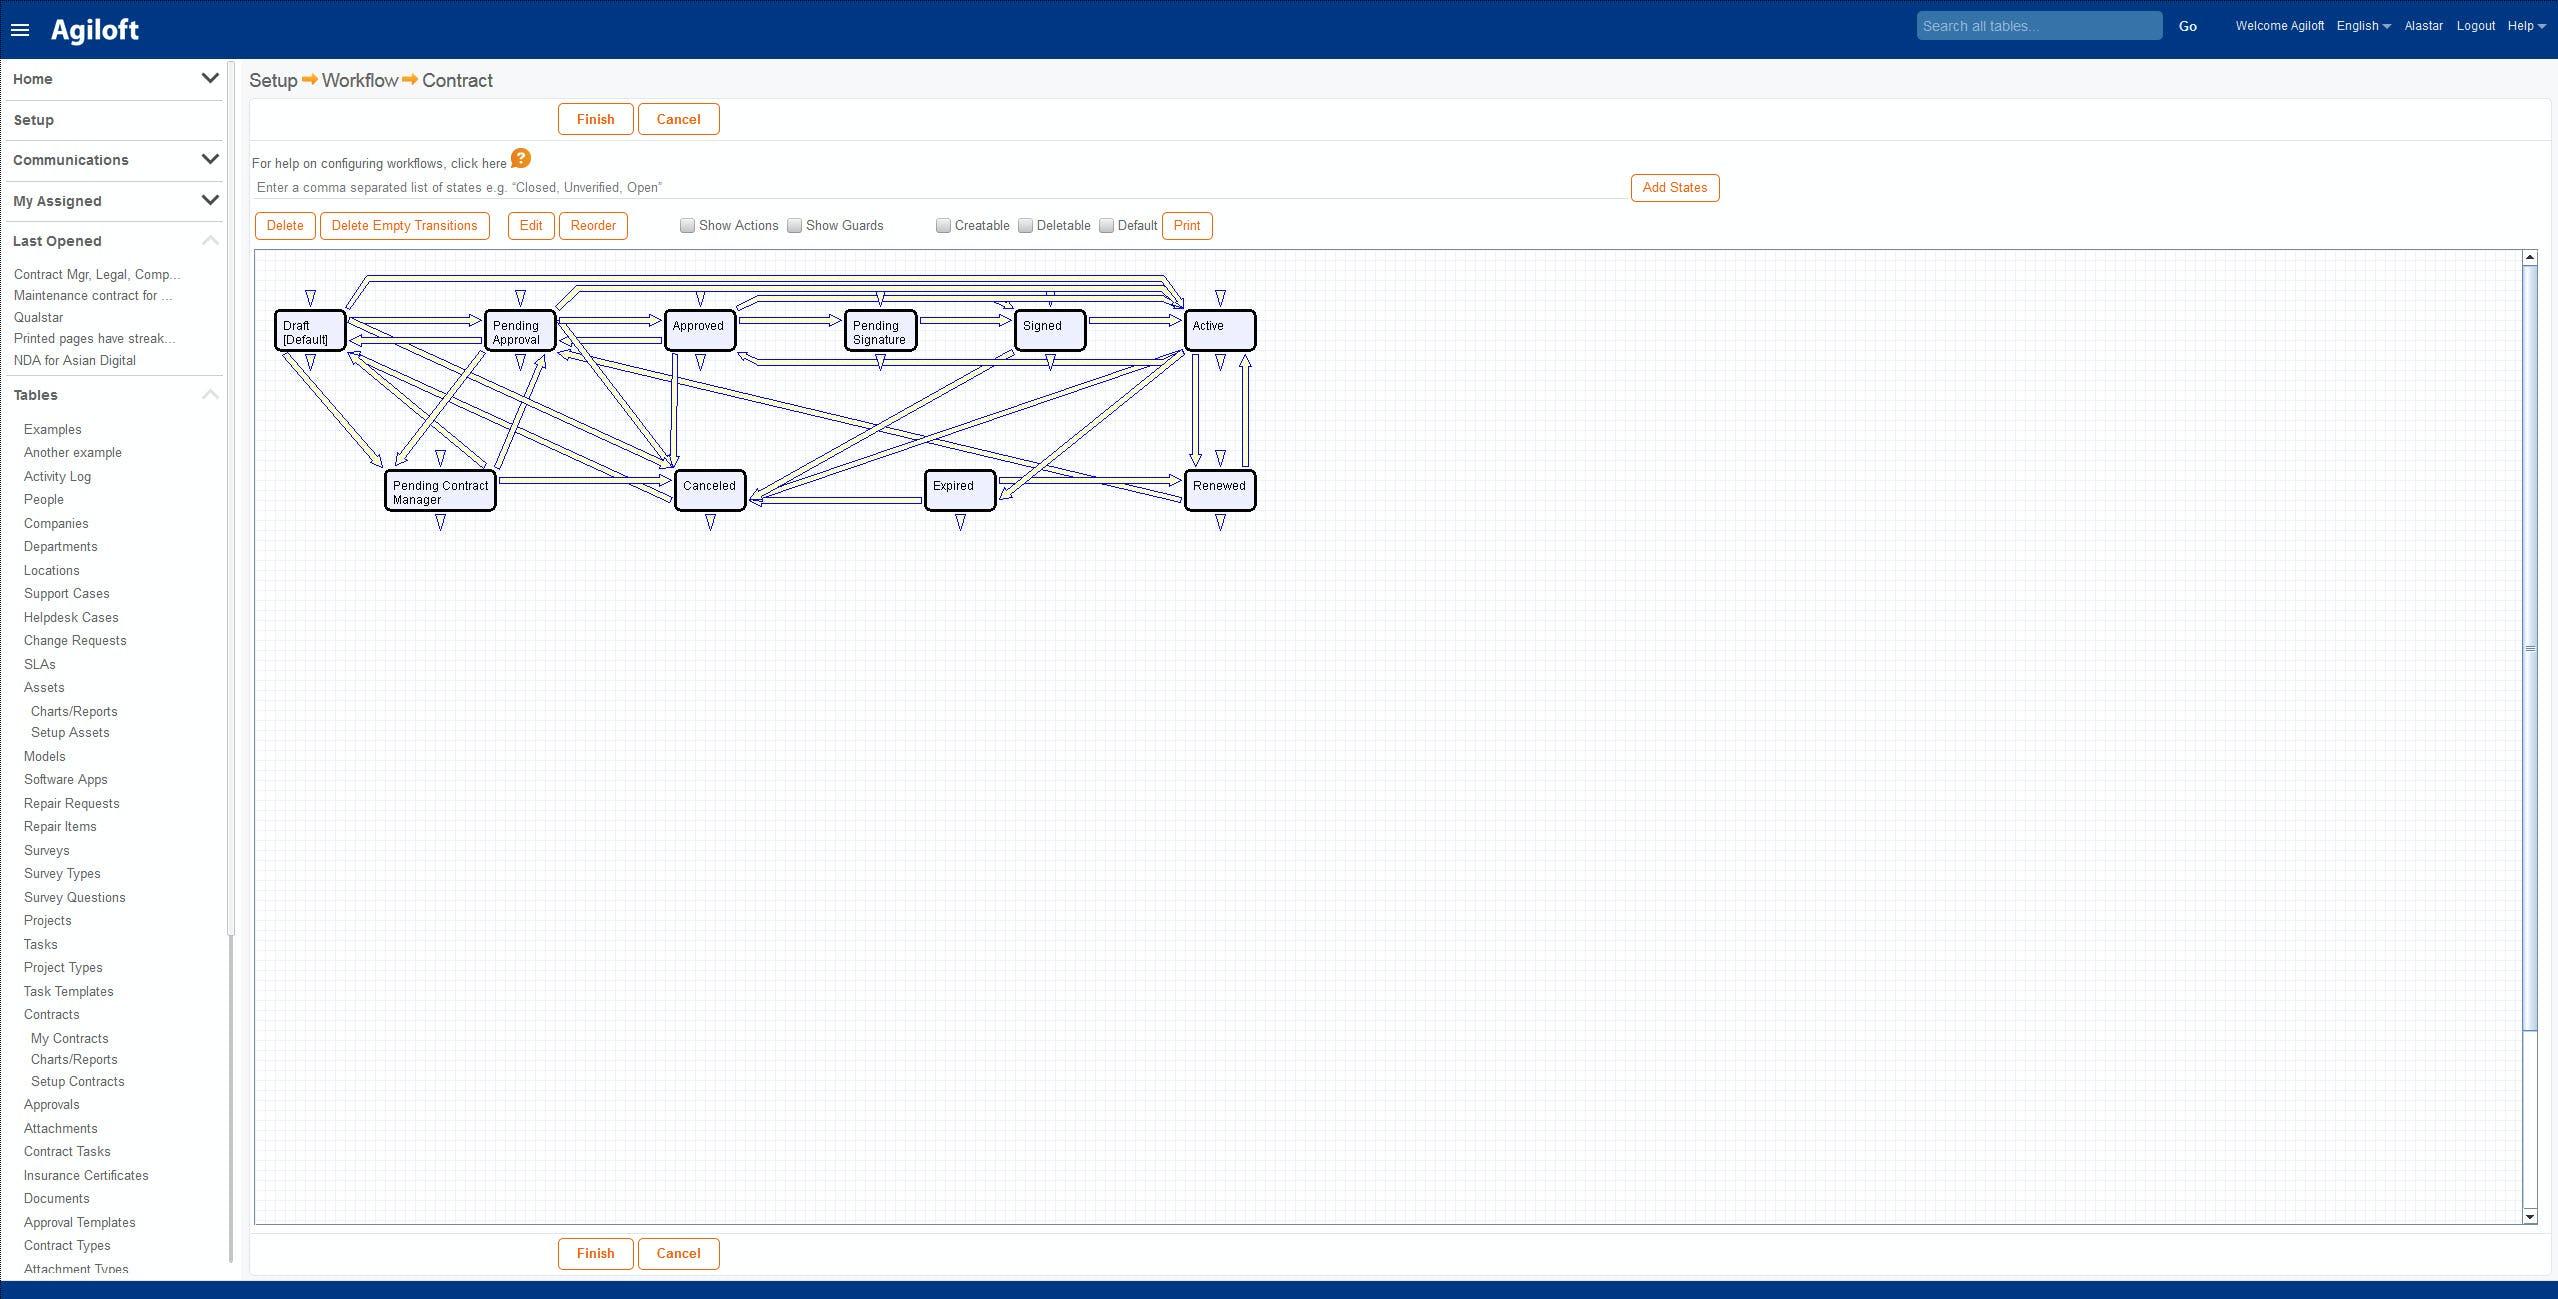 Agiloft Software - Workflow